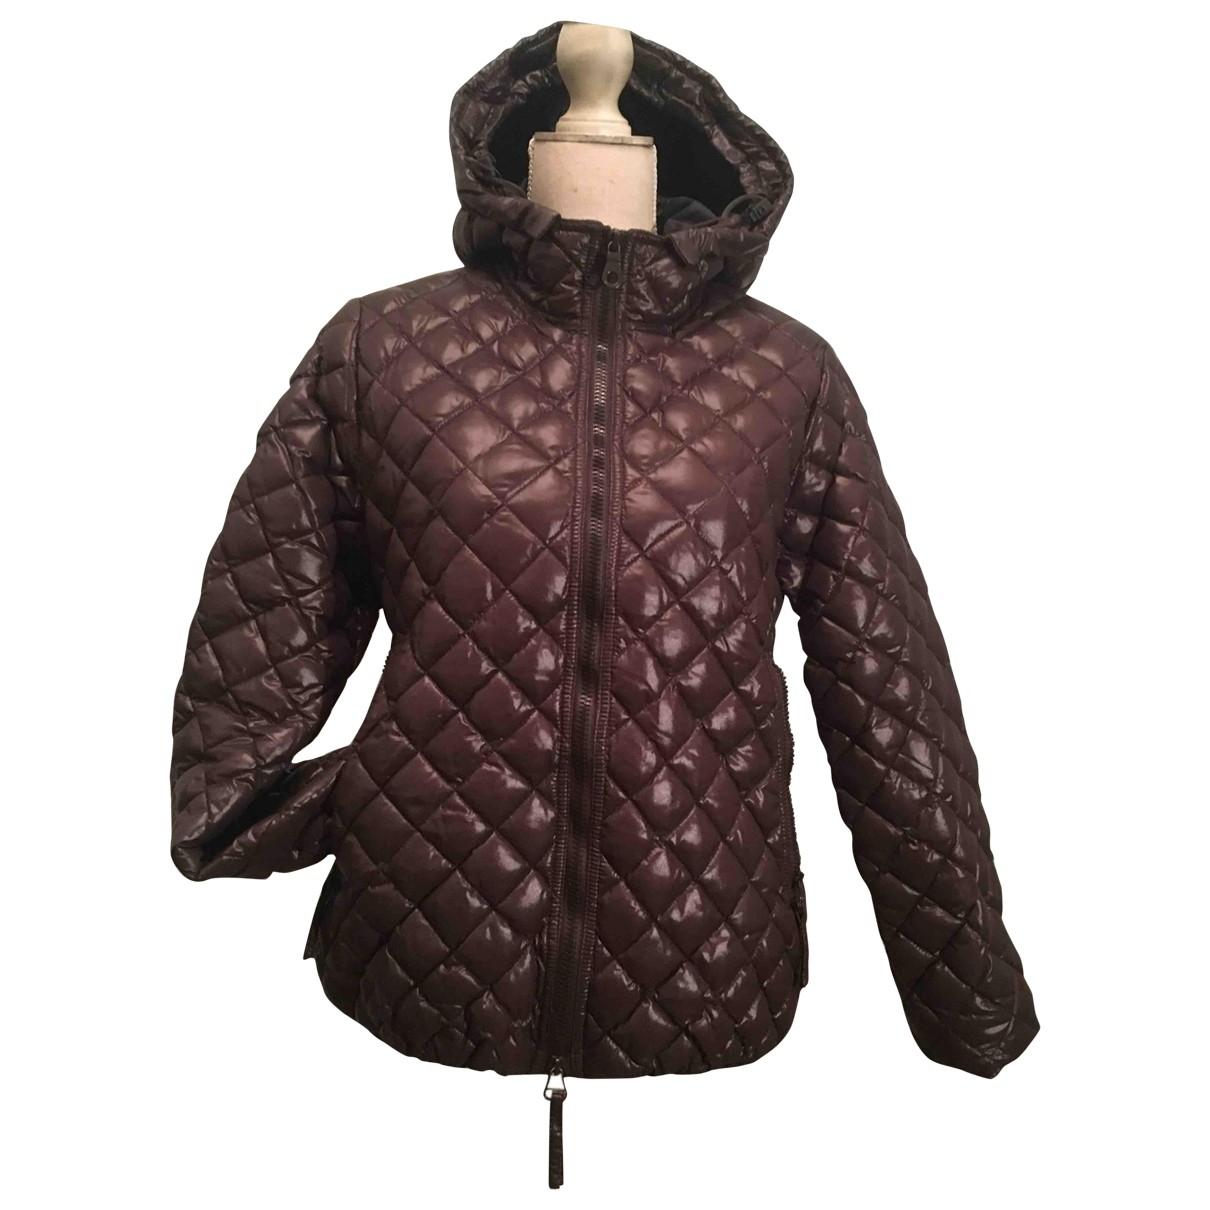 Duvetica \N Brown jacket for Women 44 IT